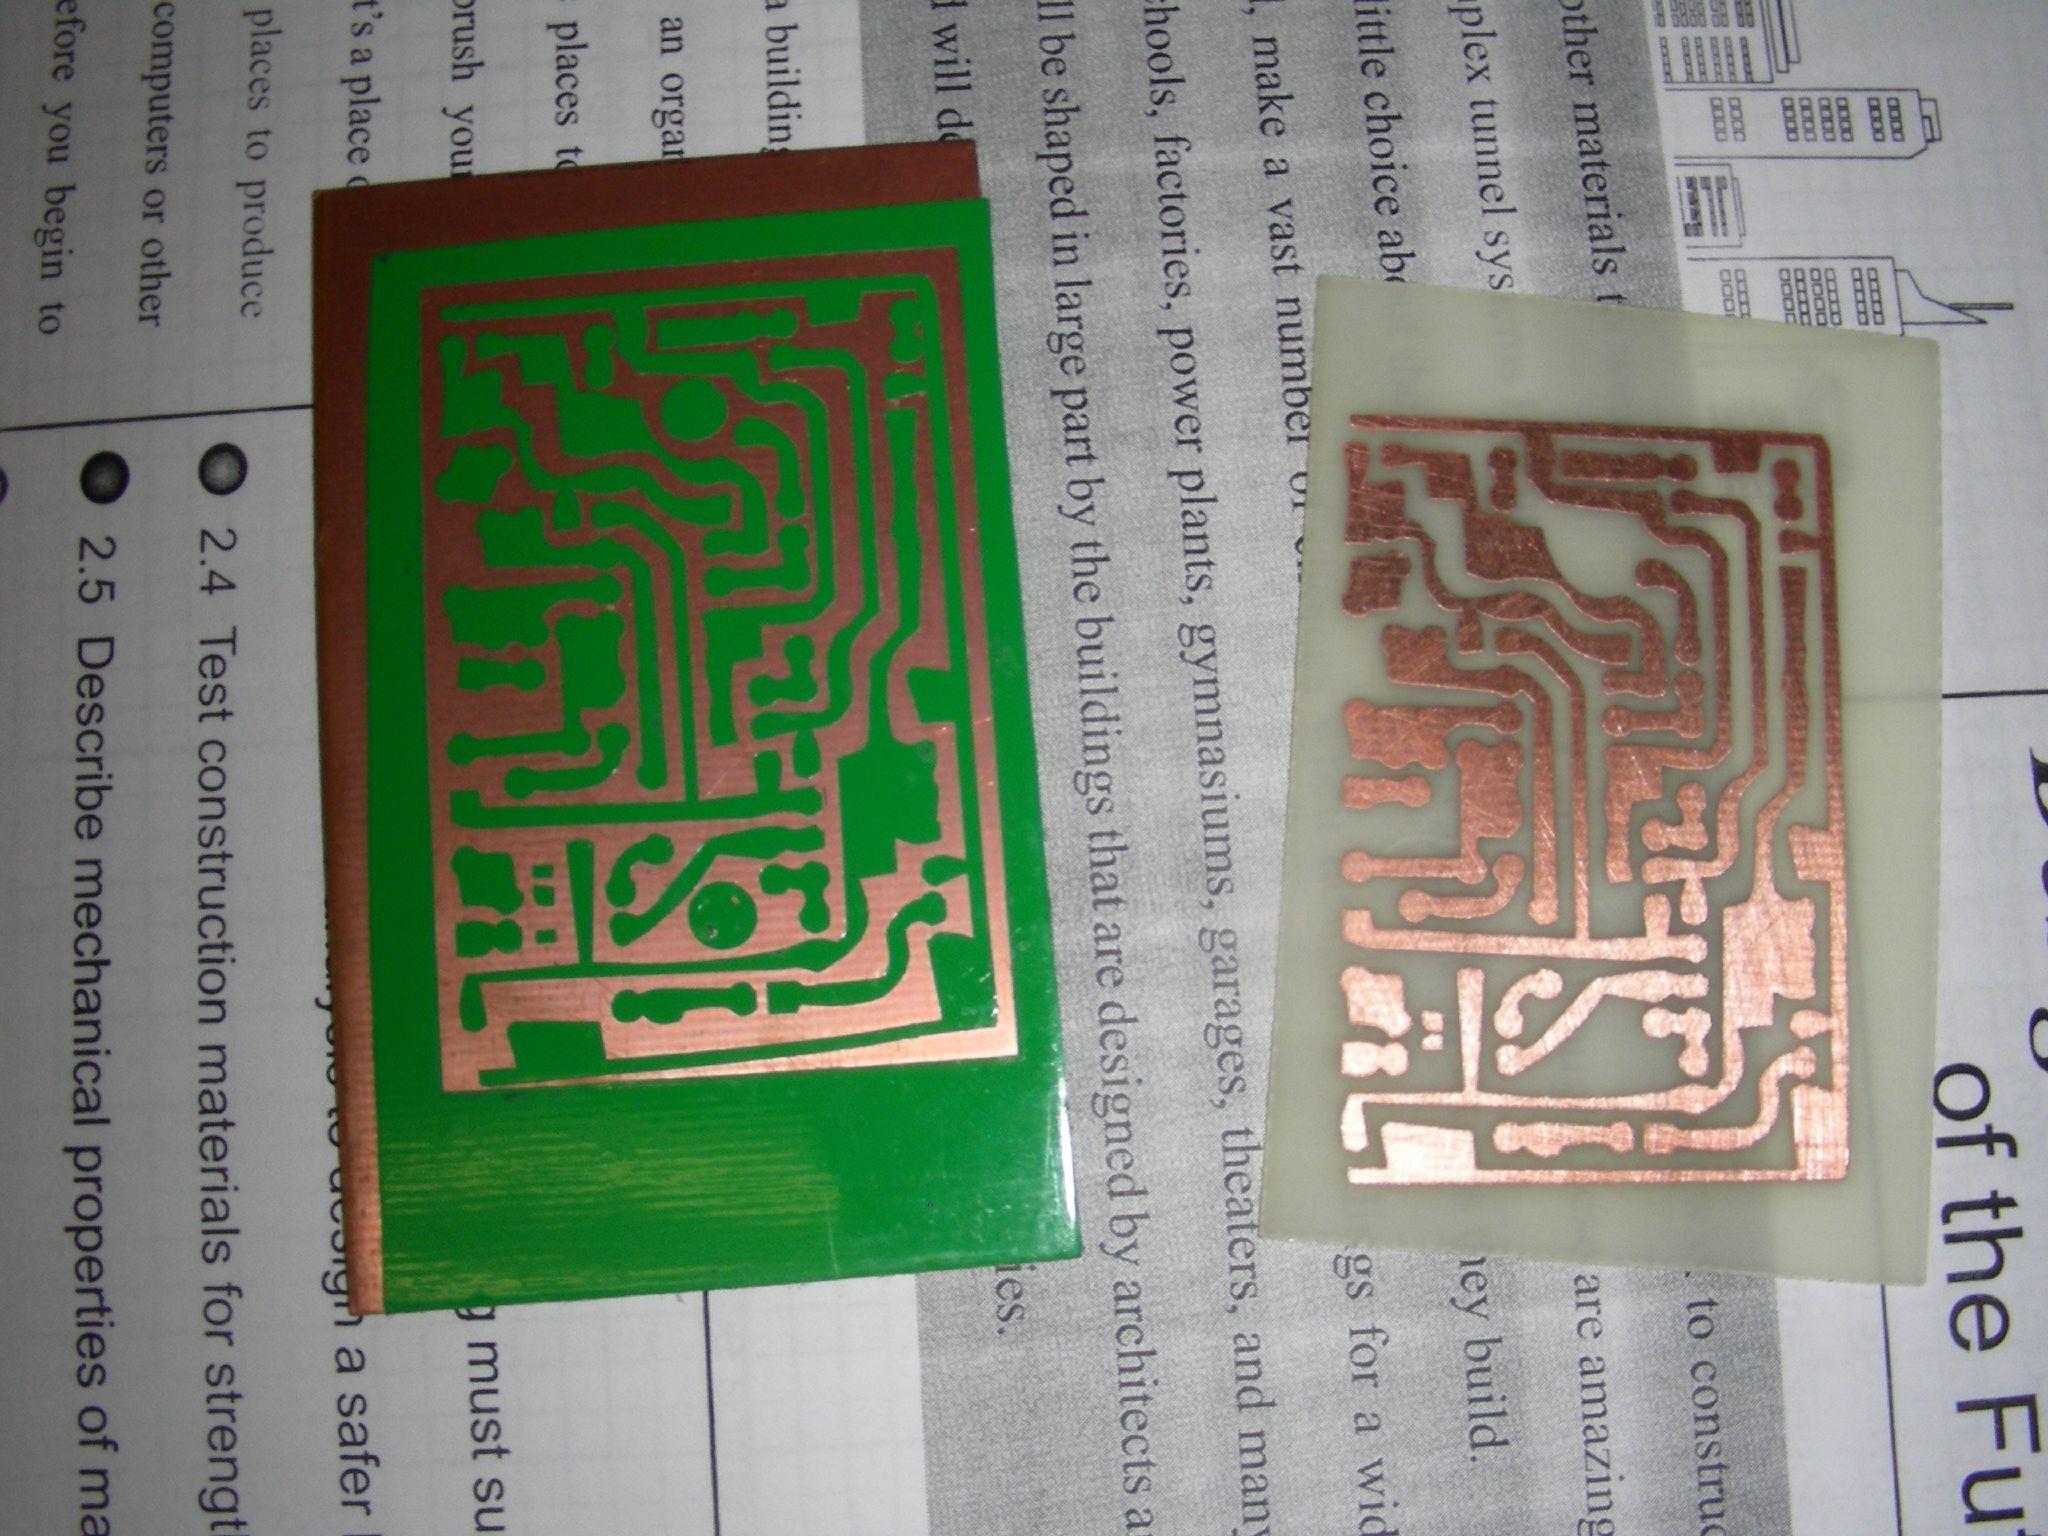 Vinyl Cut PCBResist